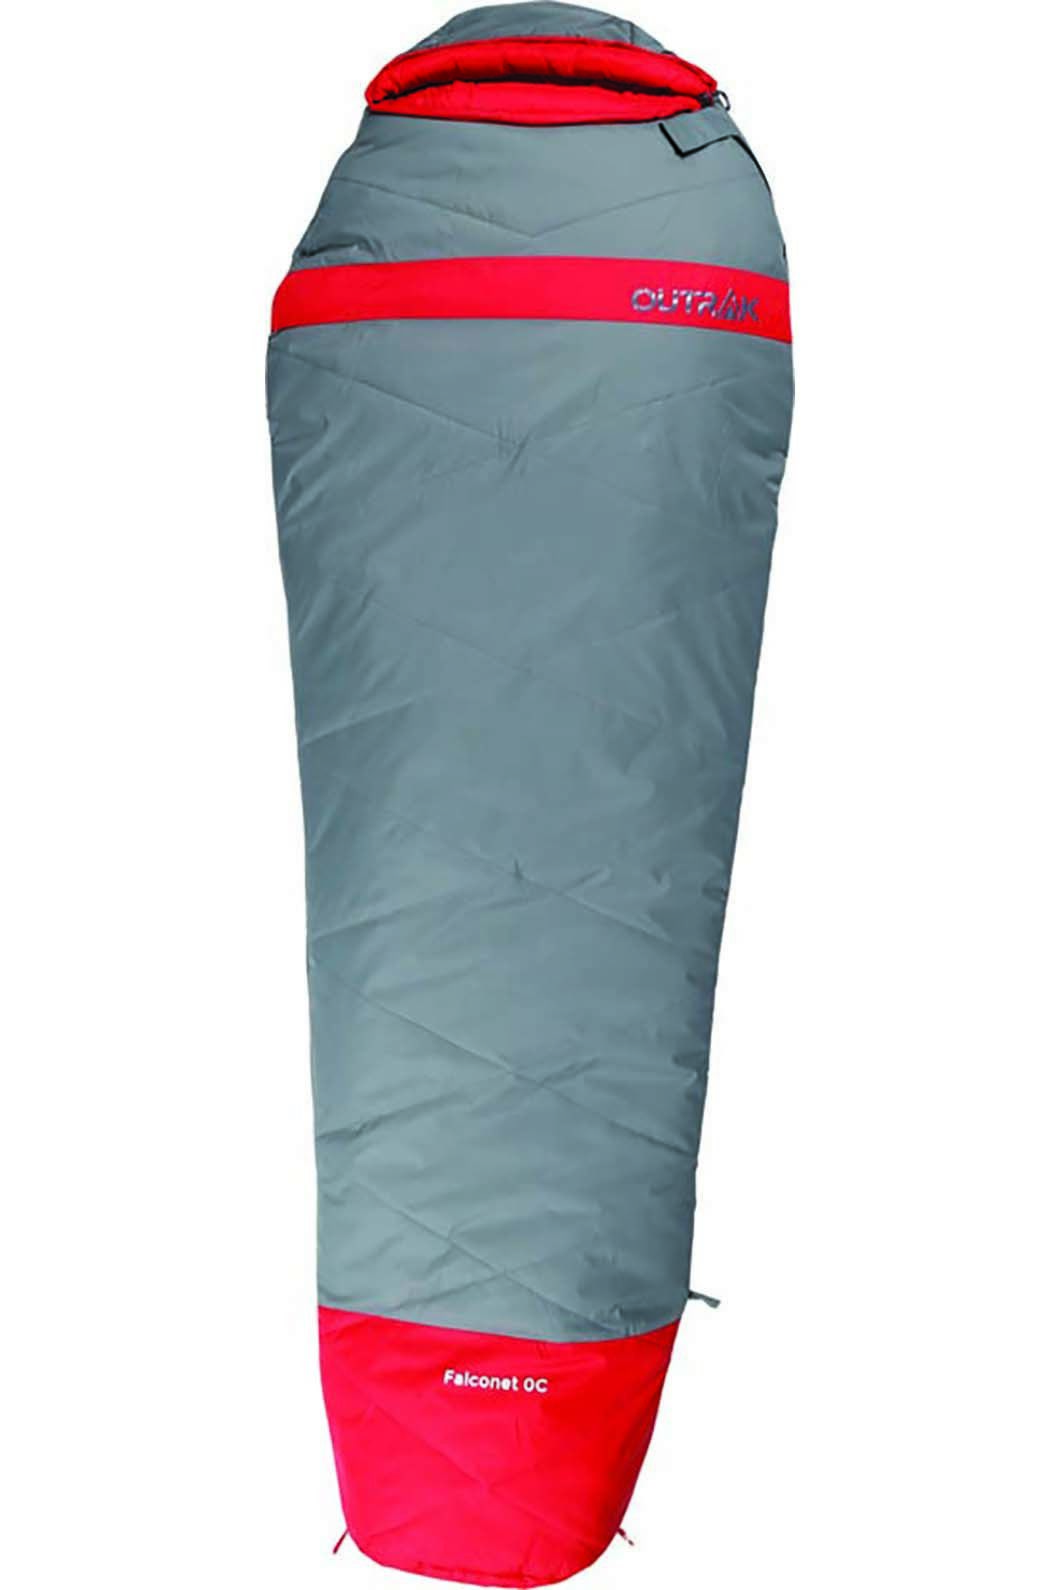 Outrak Falconet Sleeping Bag 0, None, hi-res